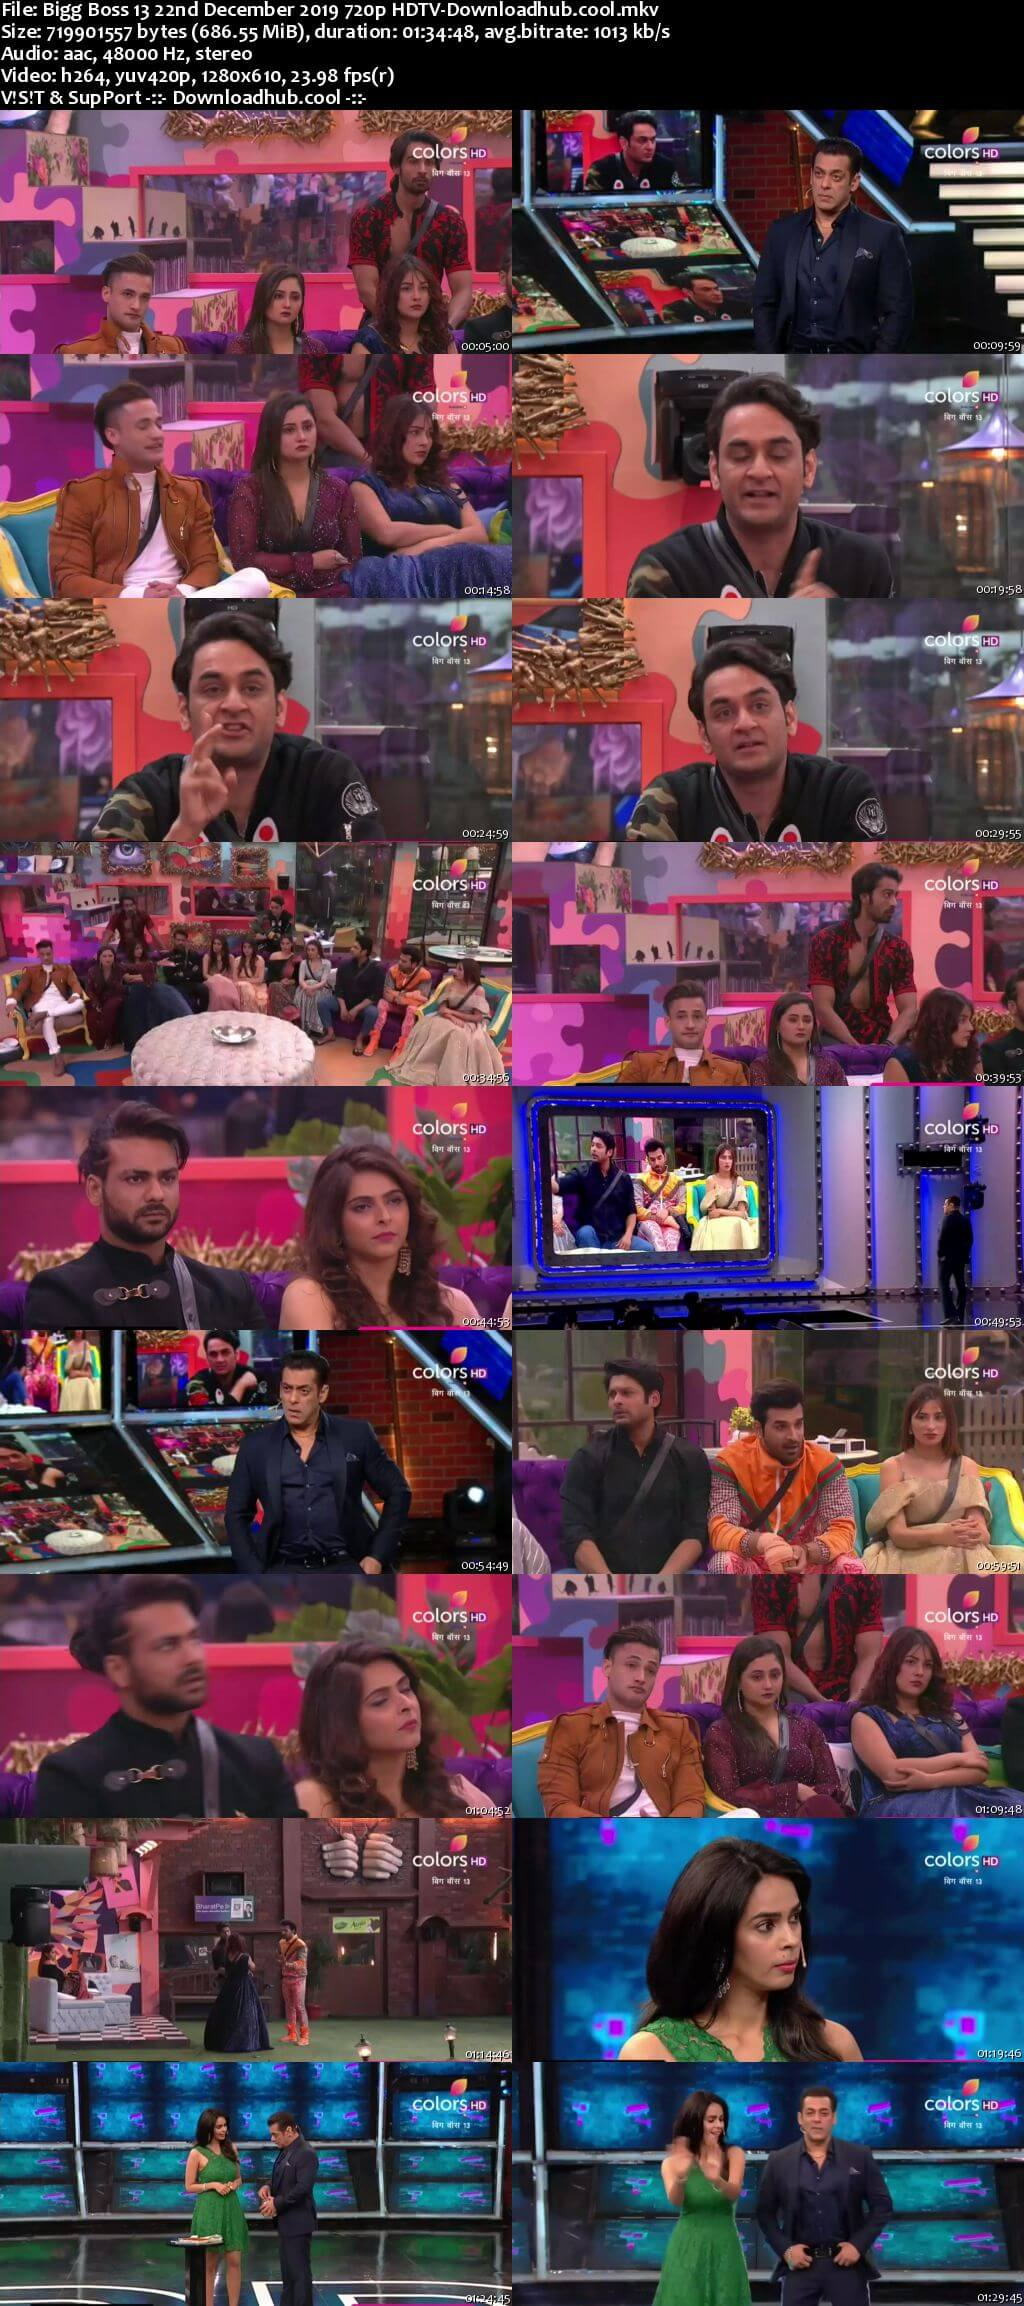 Bigg Boss 13 22 December 2019 Episode 83 HDTV 720p 480p